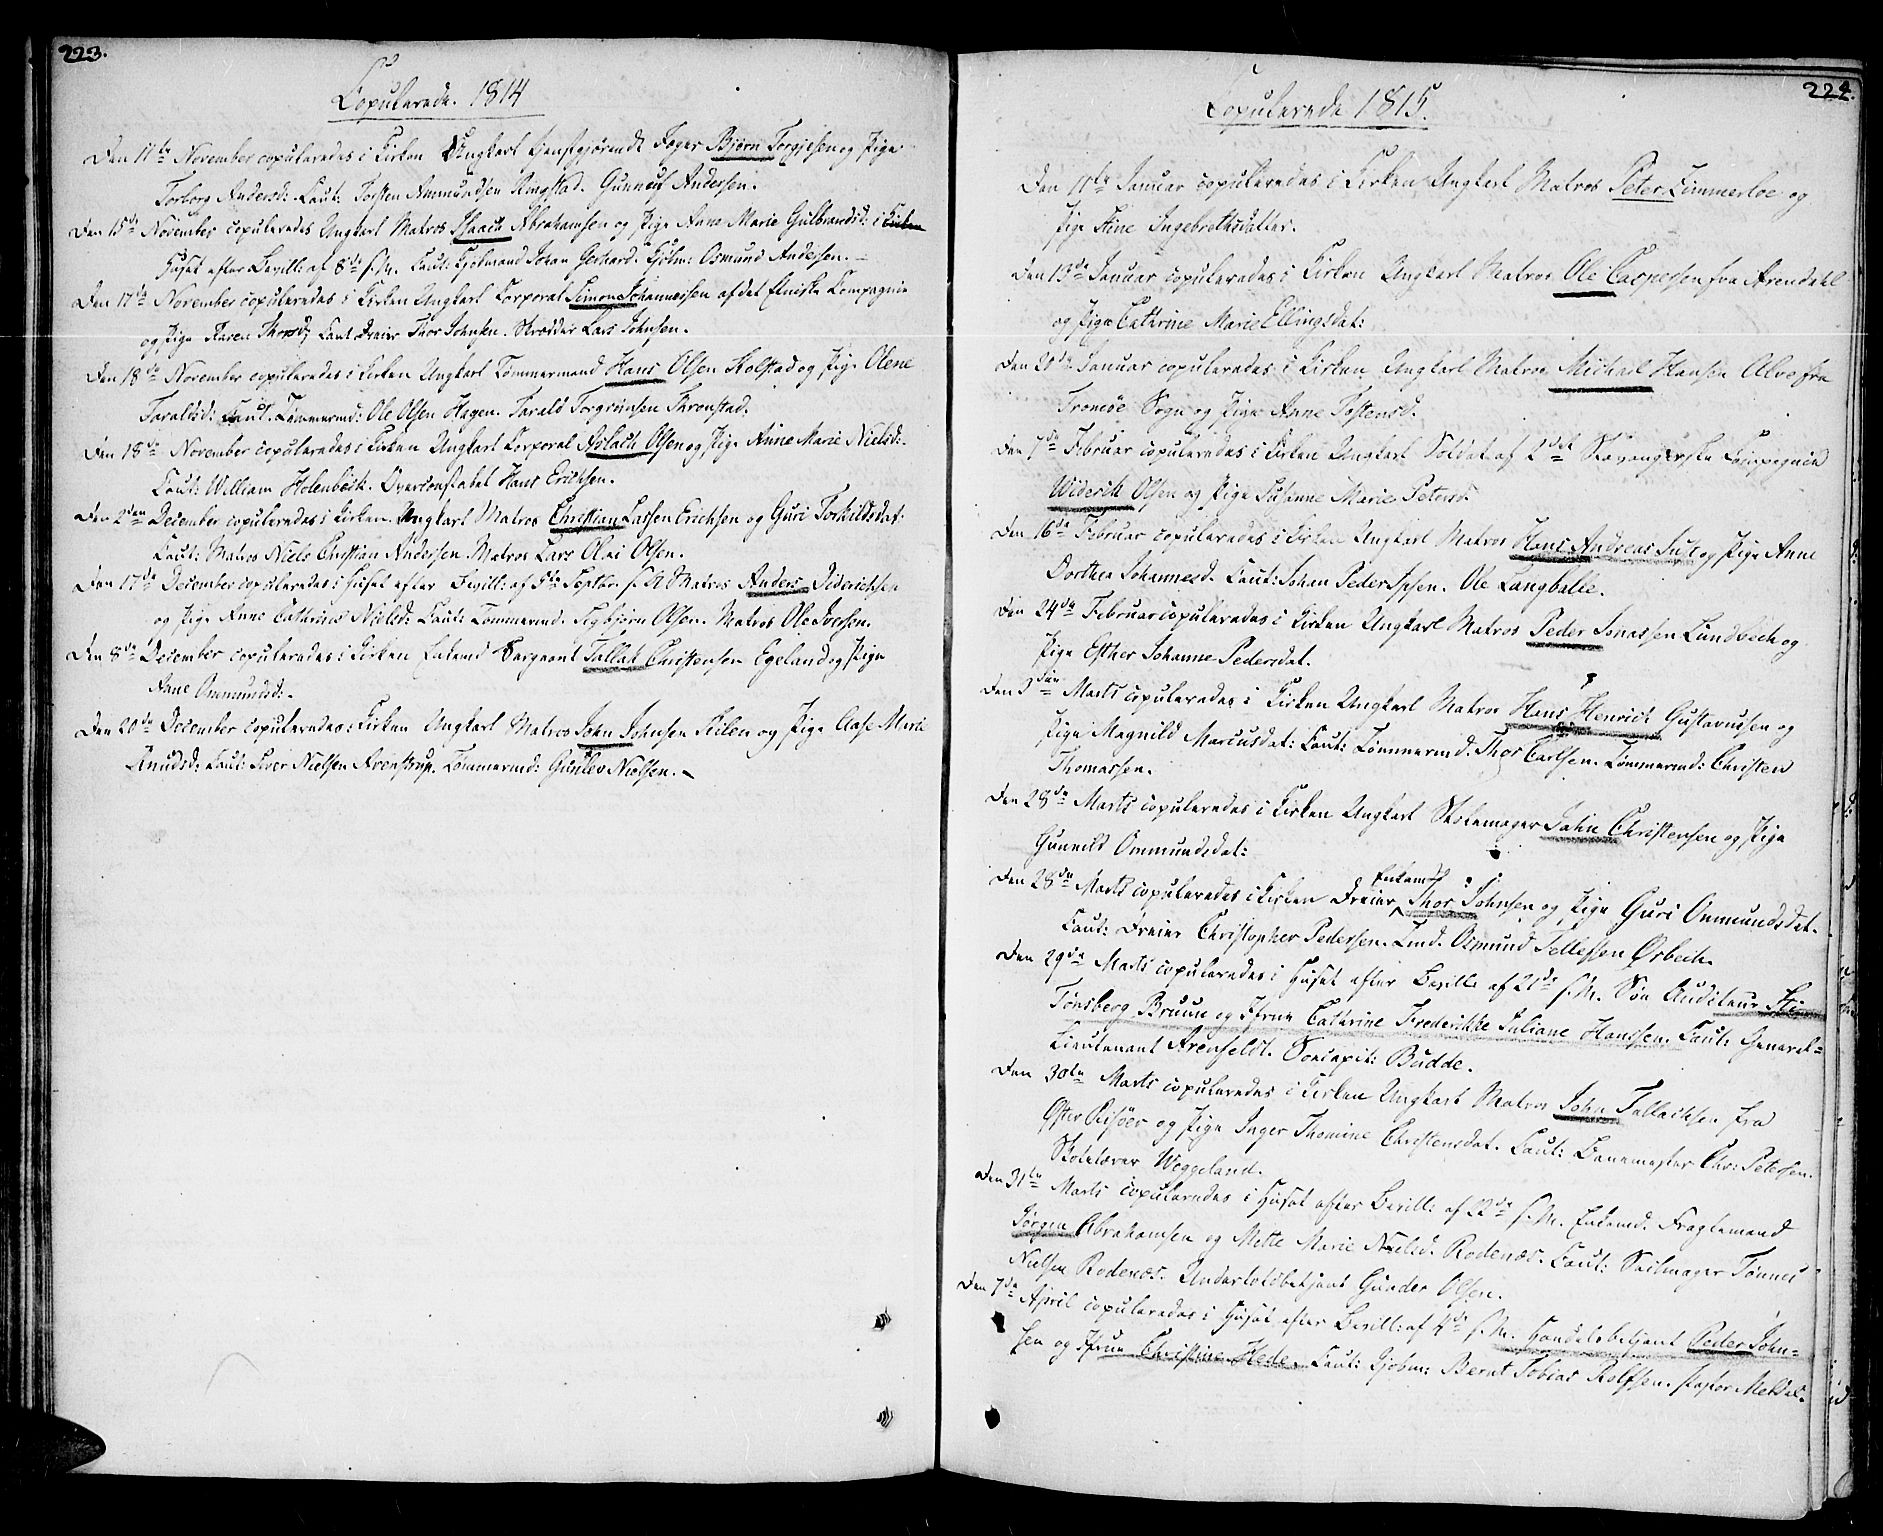 SAK, Kristiansand domprosti, F/Fa/L0005: Ministerialbok nr. A 5, 1776-1818, s. 223-224